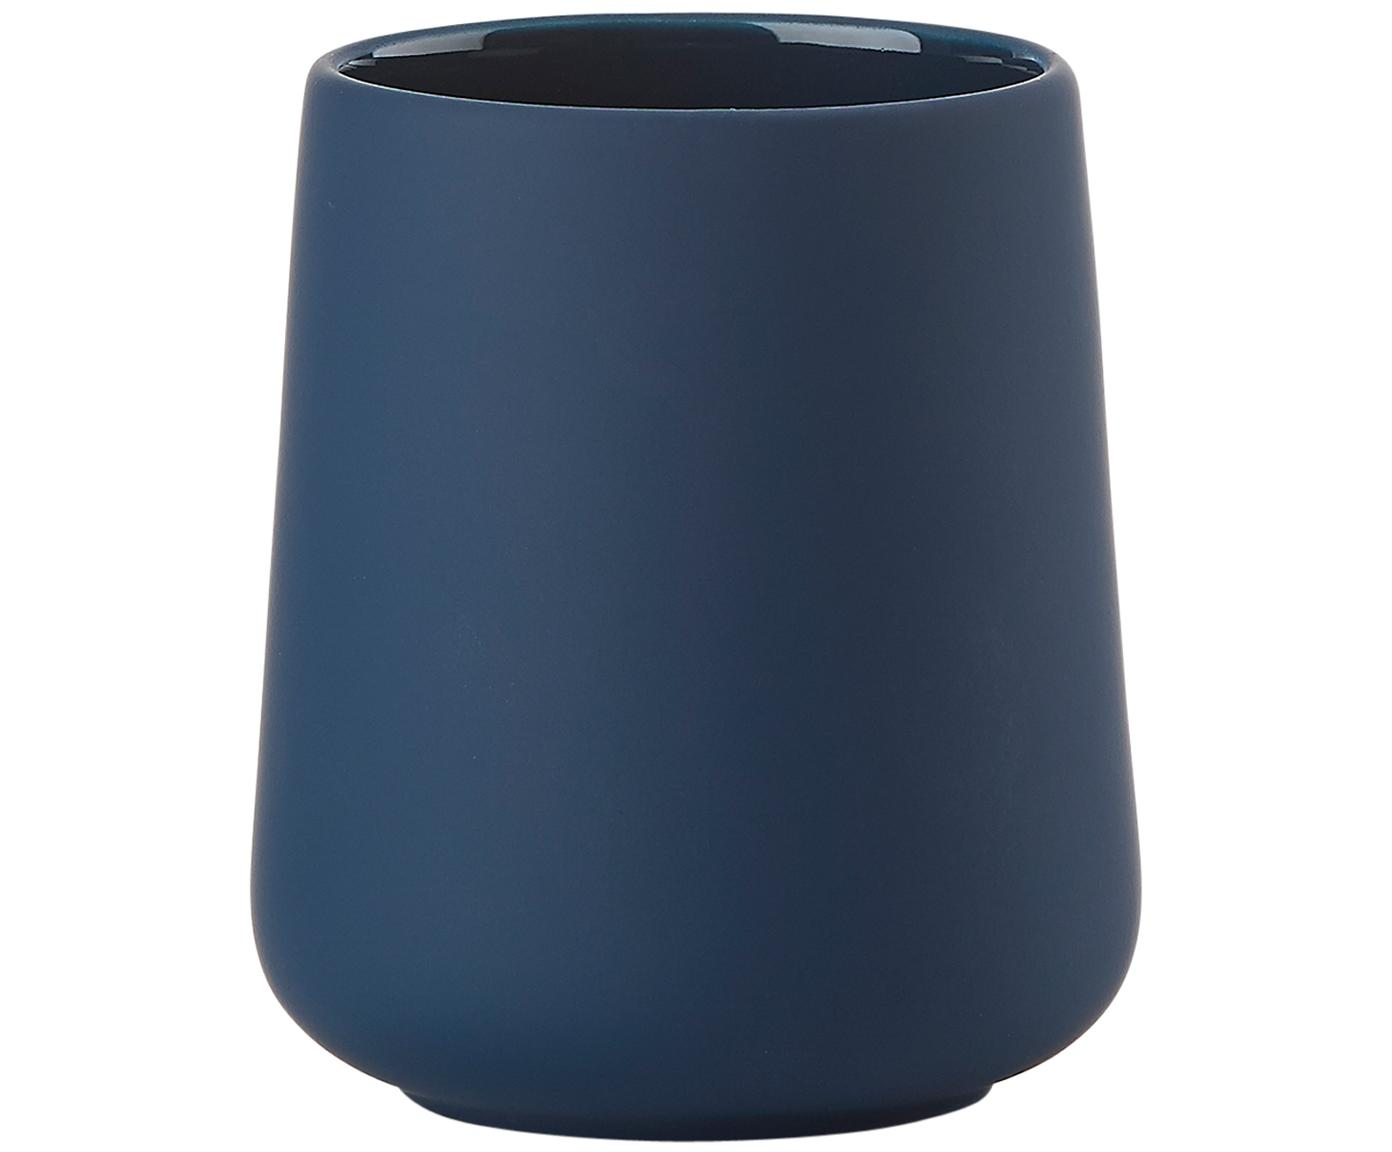 Tandenpoetsbeker Clean, Keramiek, Royal blue, Ø 8 x H 10 cm